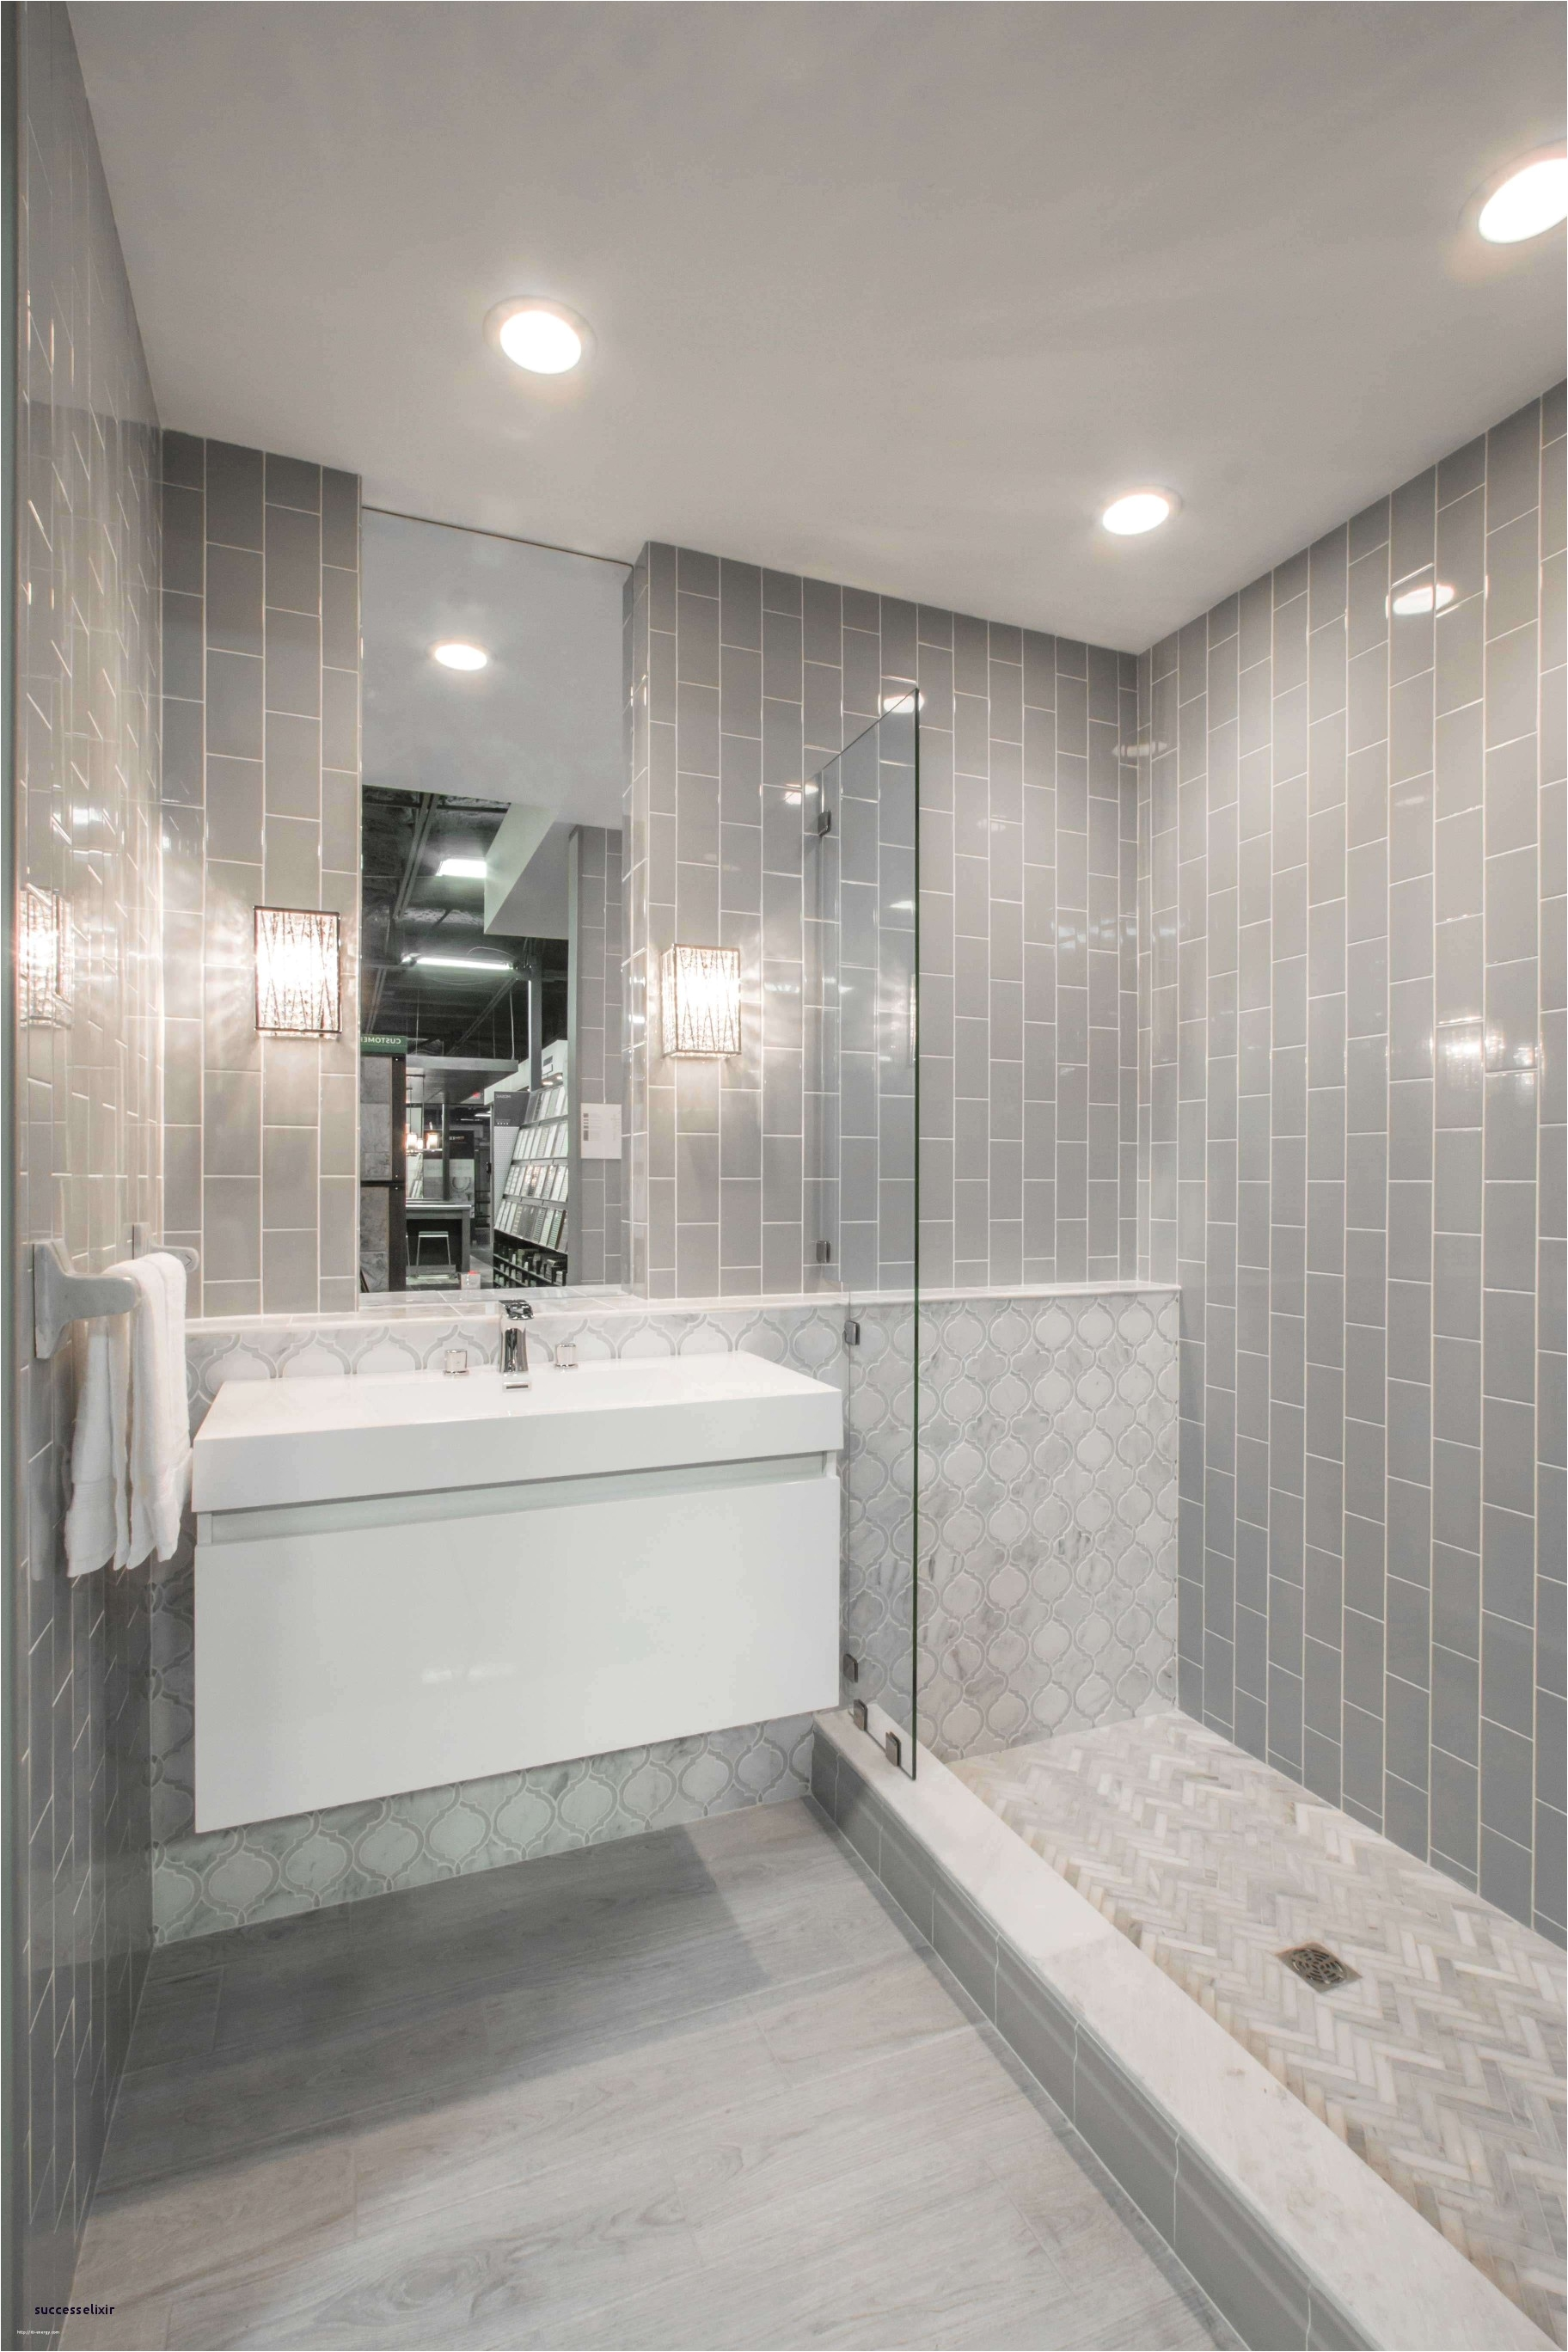 Small Bathroom Updates A Bud Stunning 20 Beautiful Stylish Bathroom Ideas Image